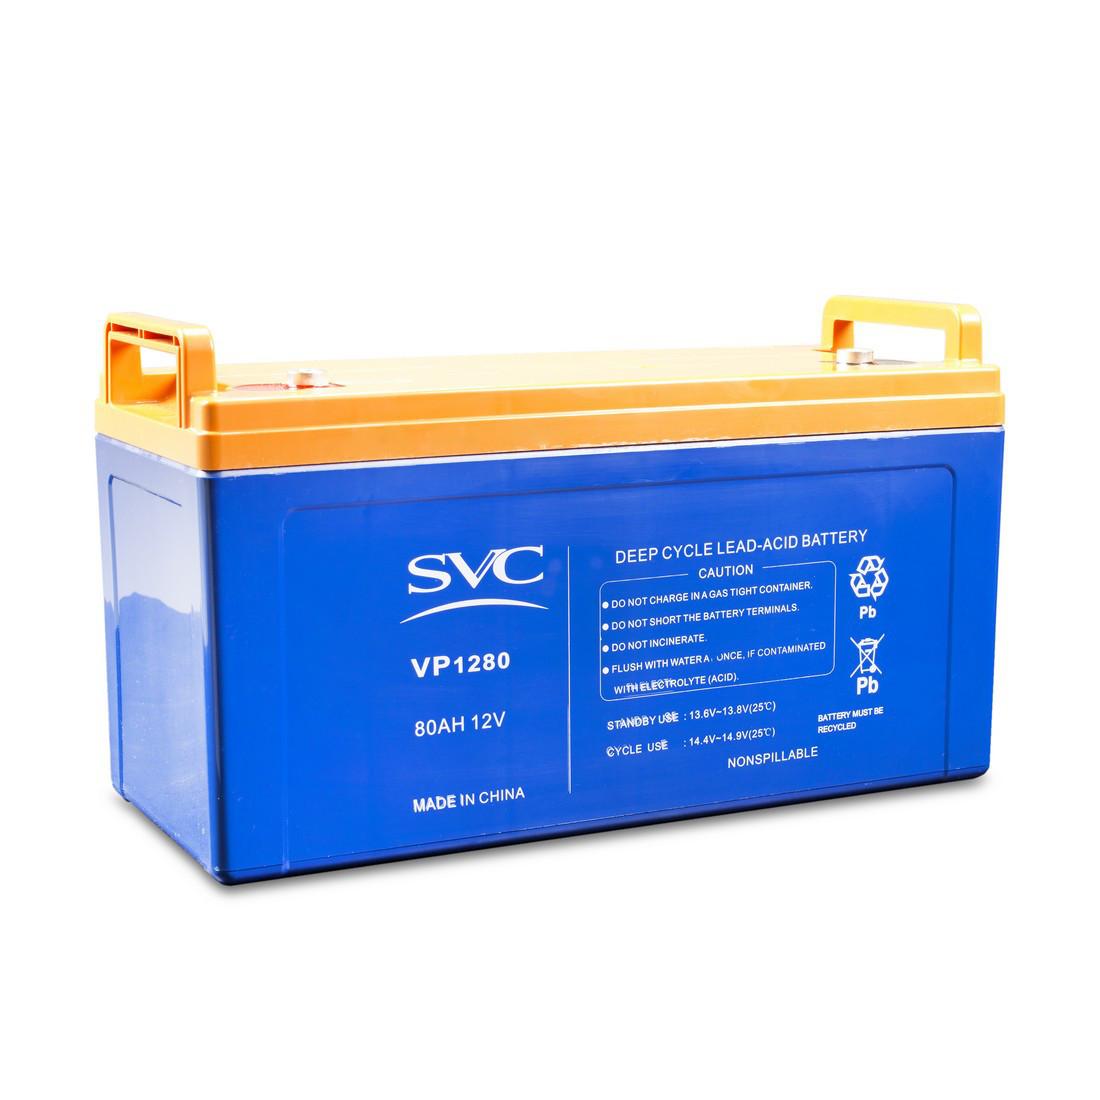 Батарея свинцово-кислотная SVC VP1280 (12В, 80 Ач)